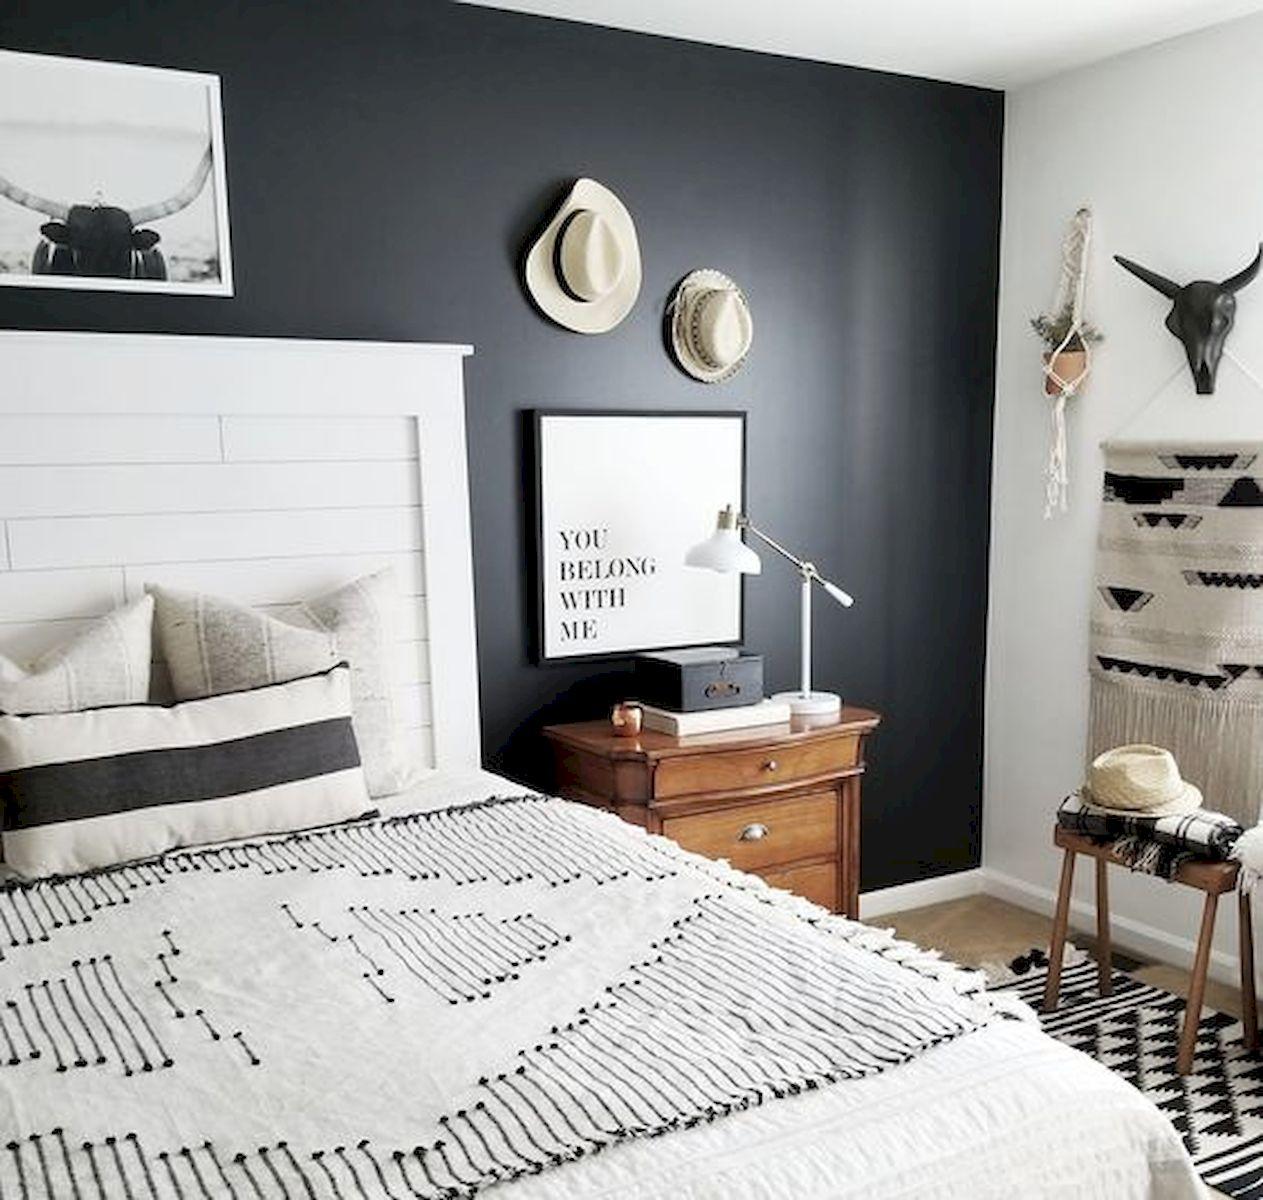 60 Beautiful Bedroom Decor and Design Ideas (52)